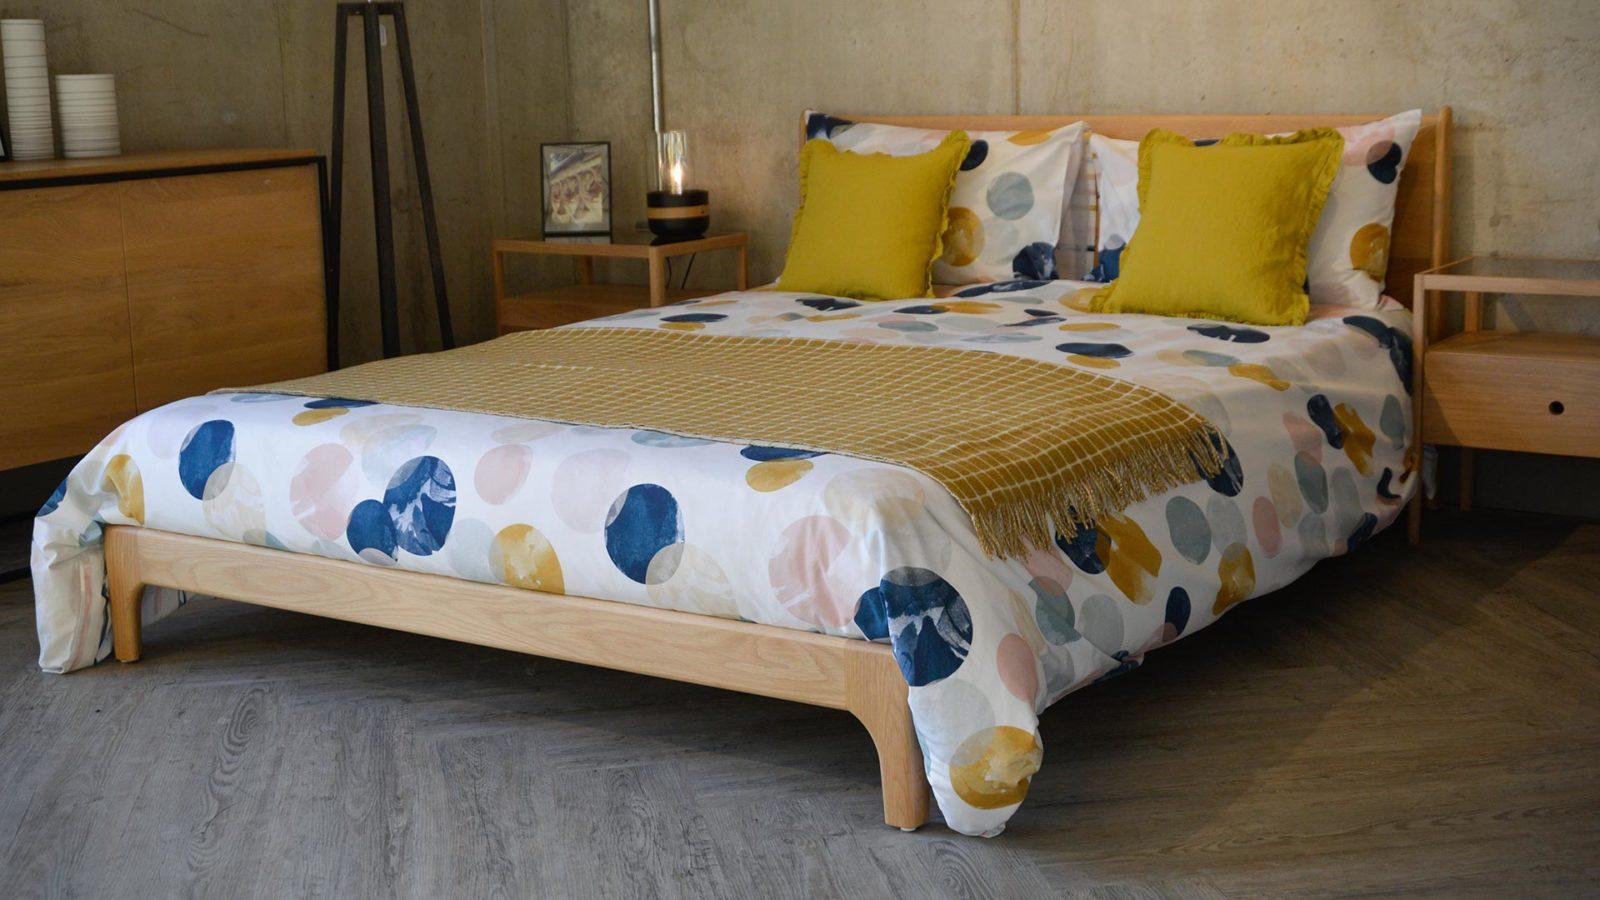 painted-circles-pattern-bedding